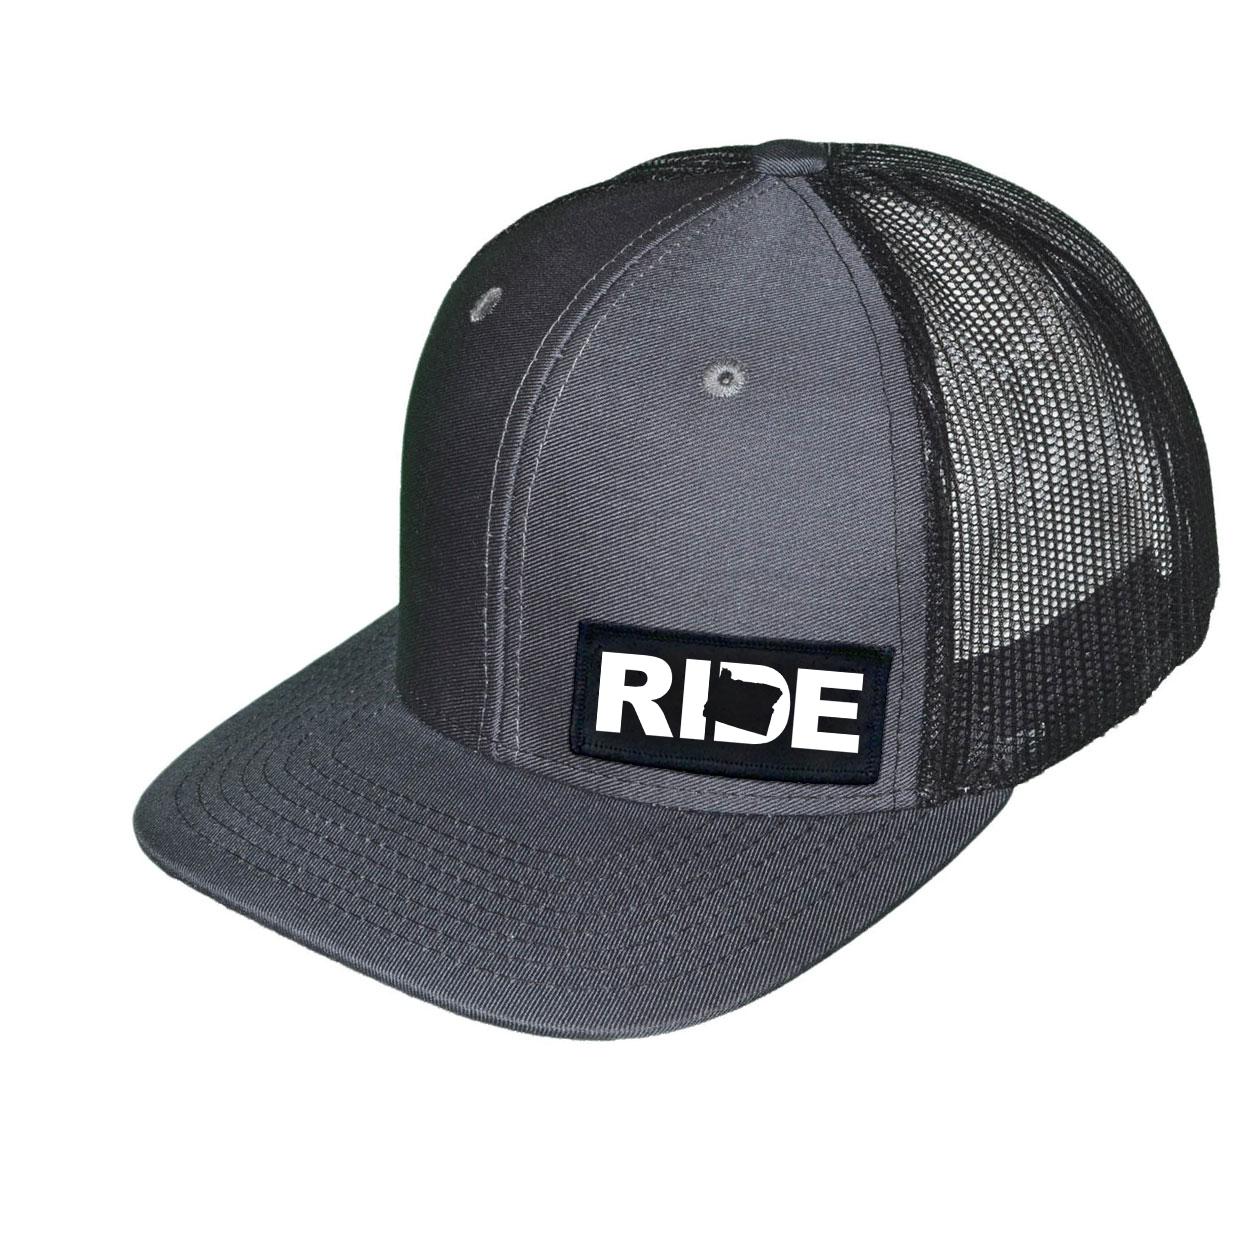 Ride Oregon Night Out Woven Patch Snapback Trucker Hat Dark Gray/Black (White Logo)